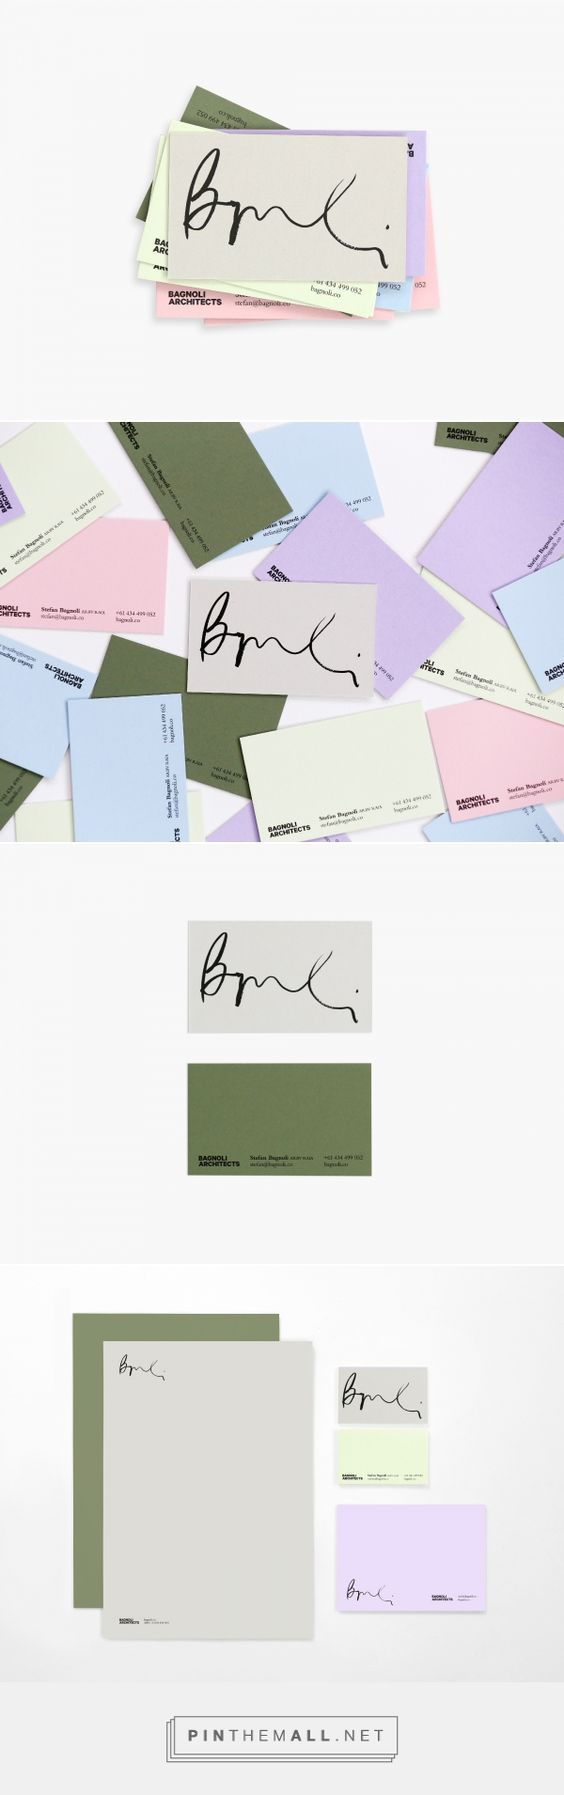 Bagnoli Architects Branding by Ortolan | Fivestar Branding – Design and Branding Agency & Inspiration Gallery